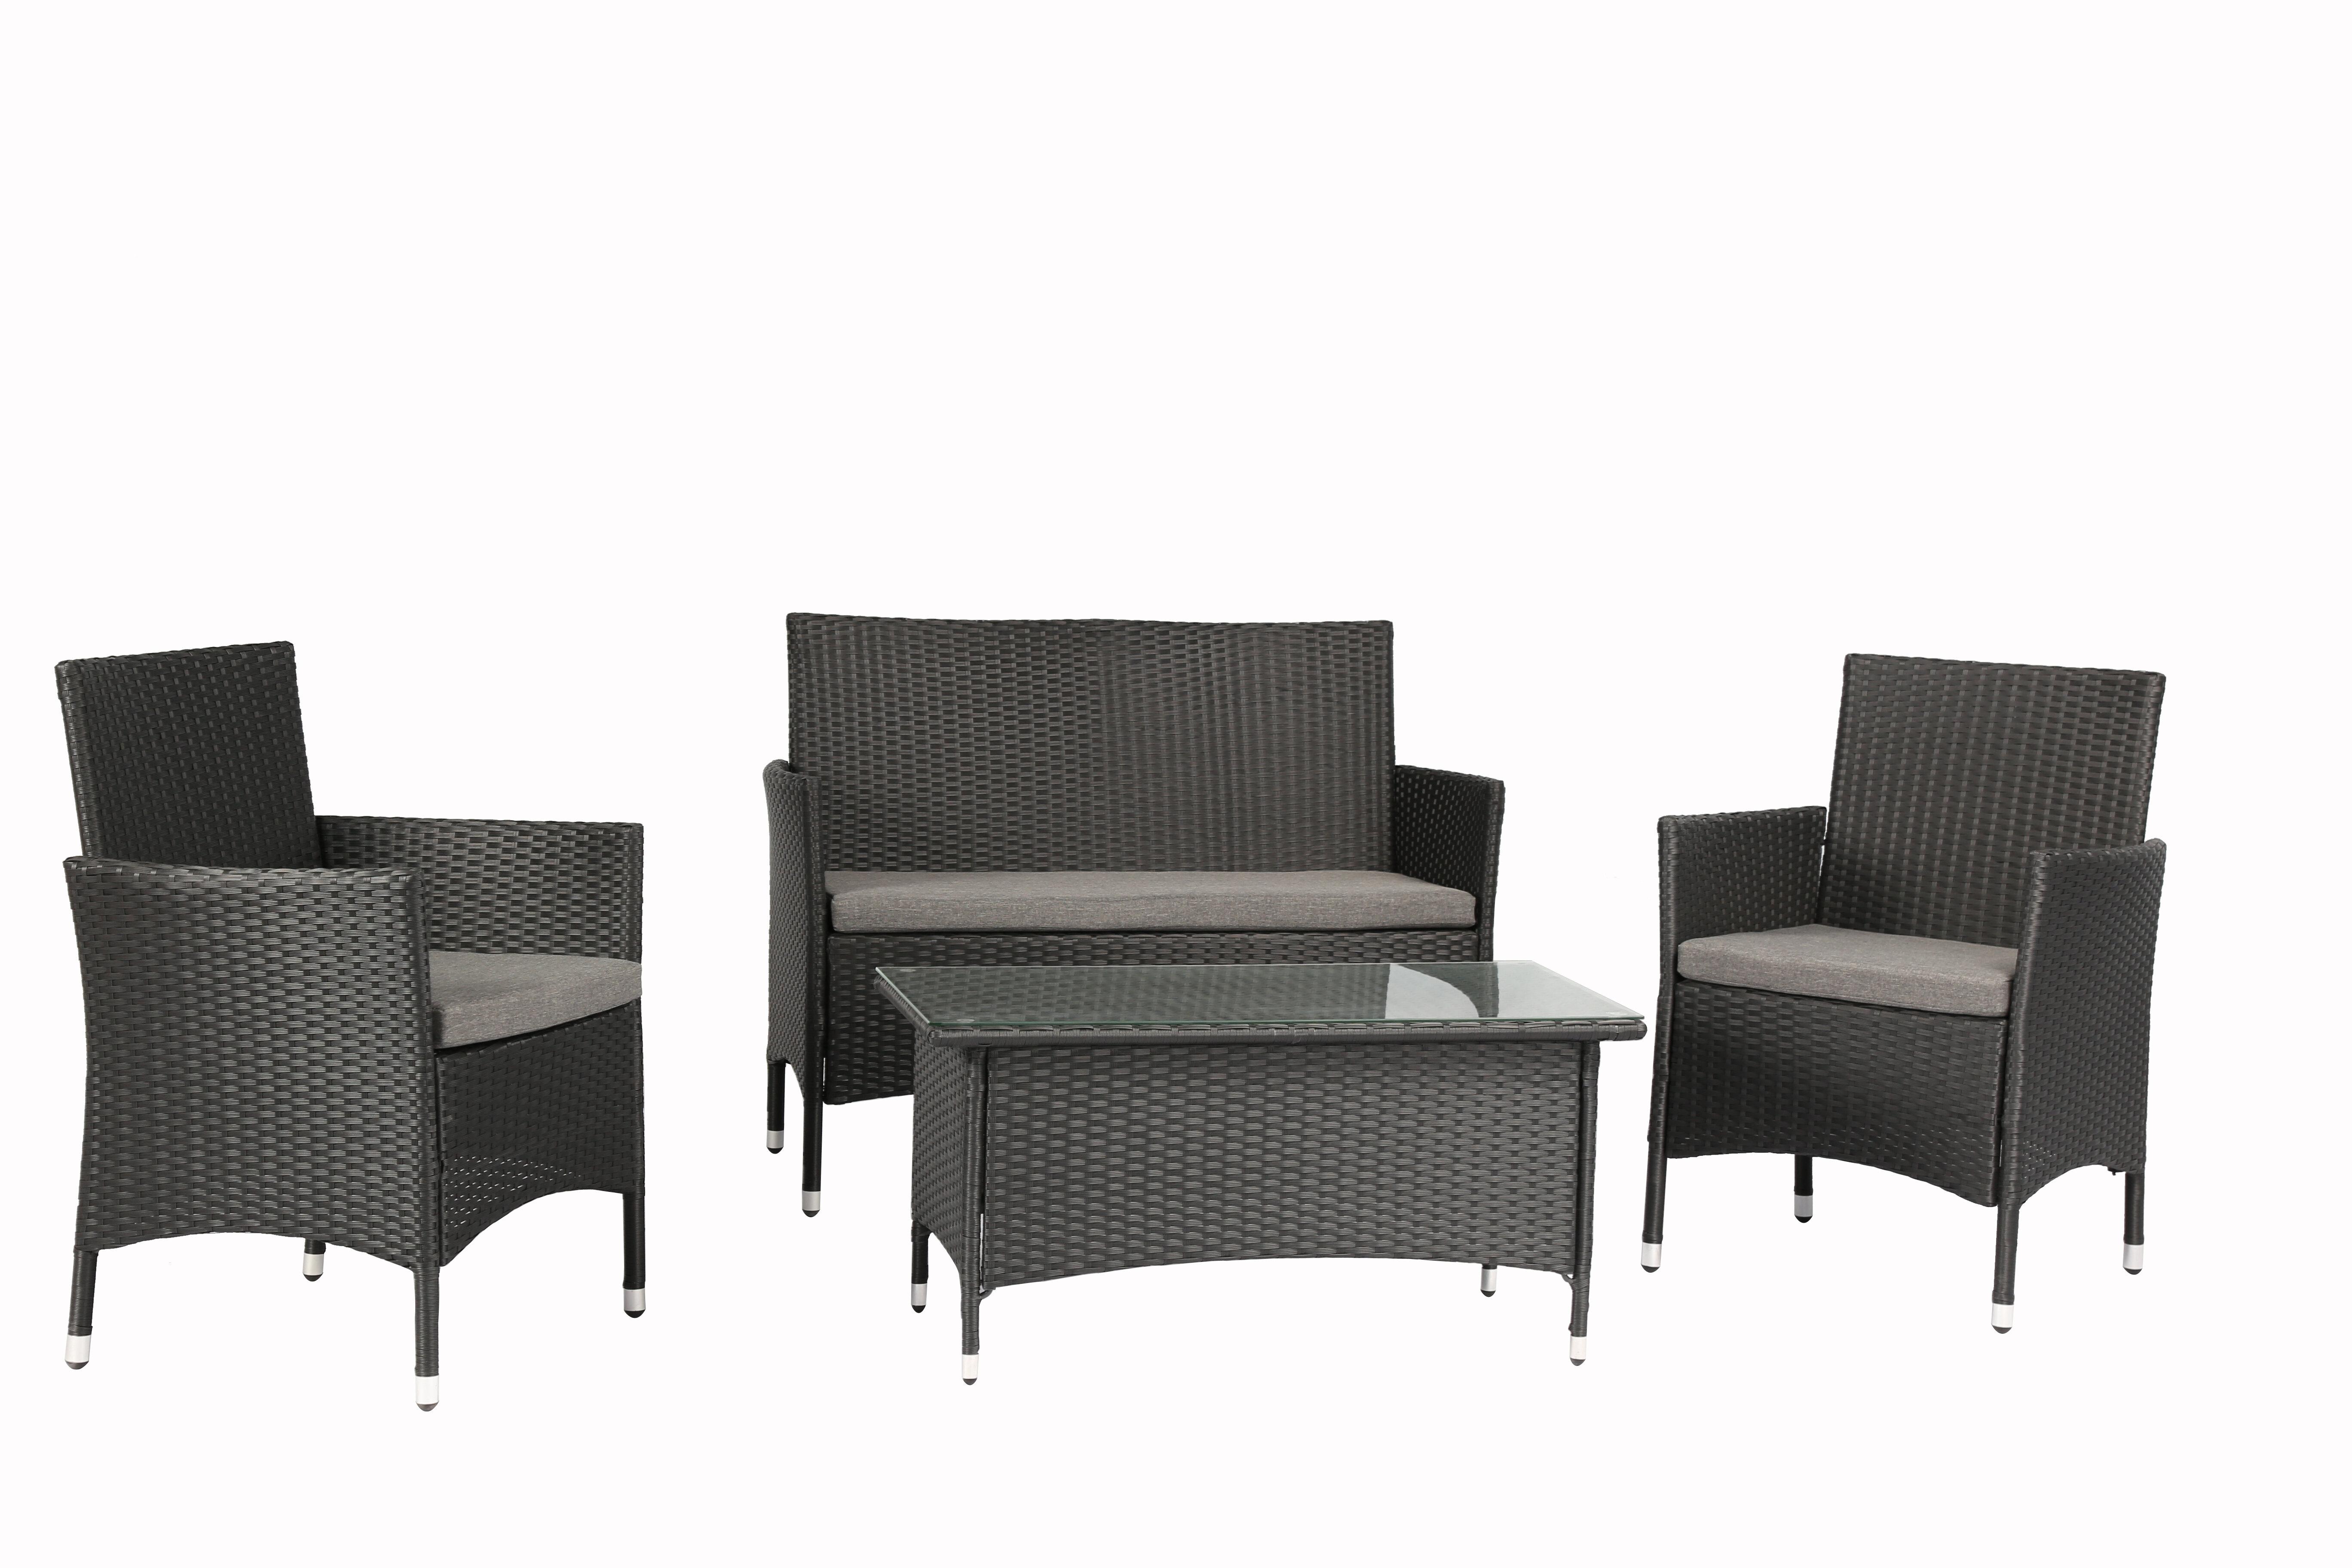 aedaf33ea7f9 Baner Garden 4 Piece Sofa Set with Cushions & Reviews   Wayfair